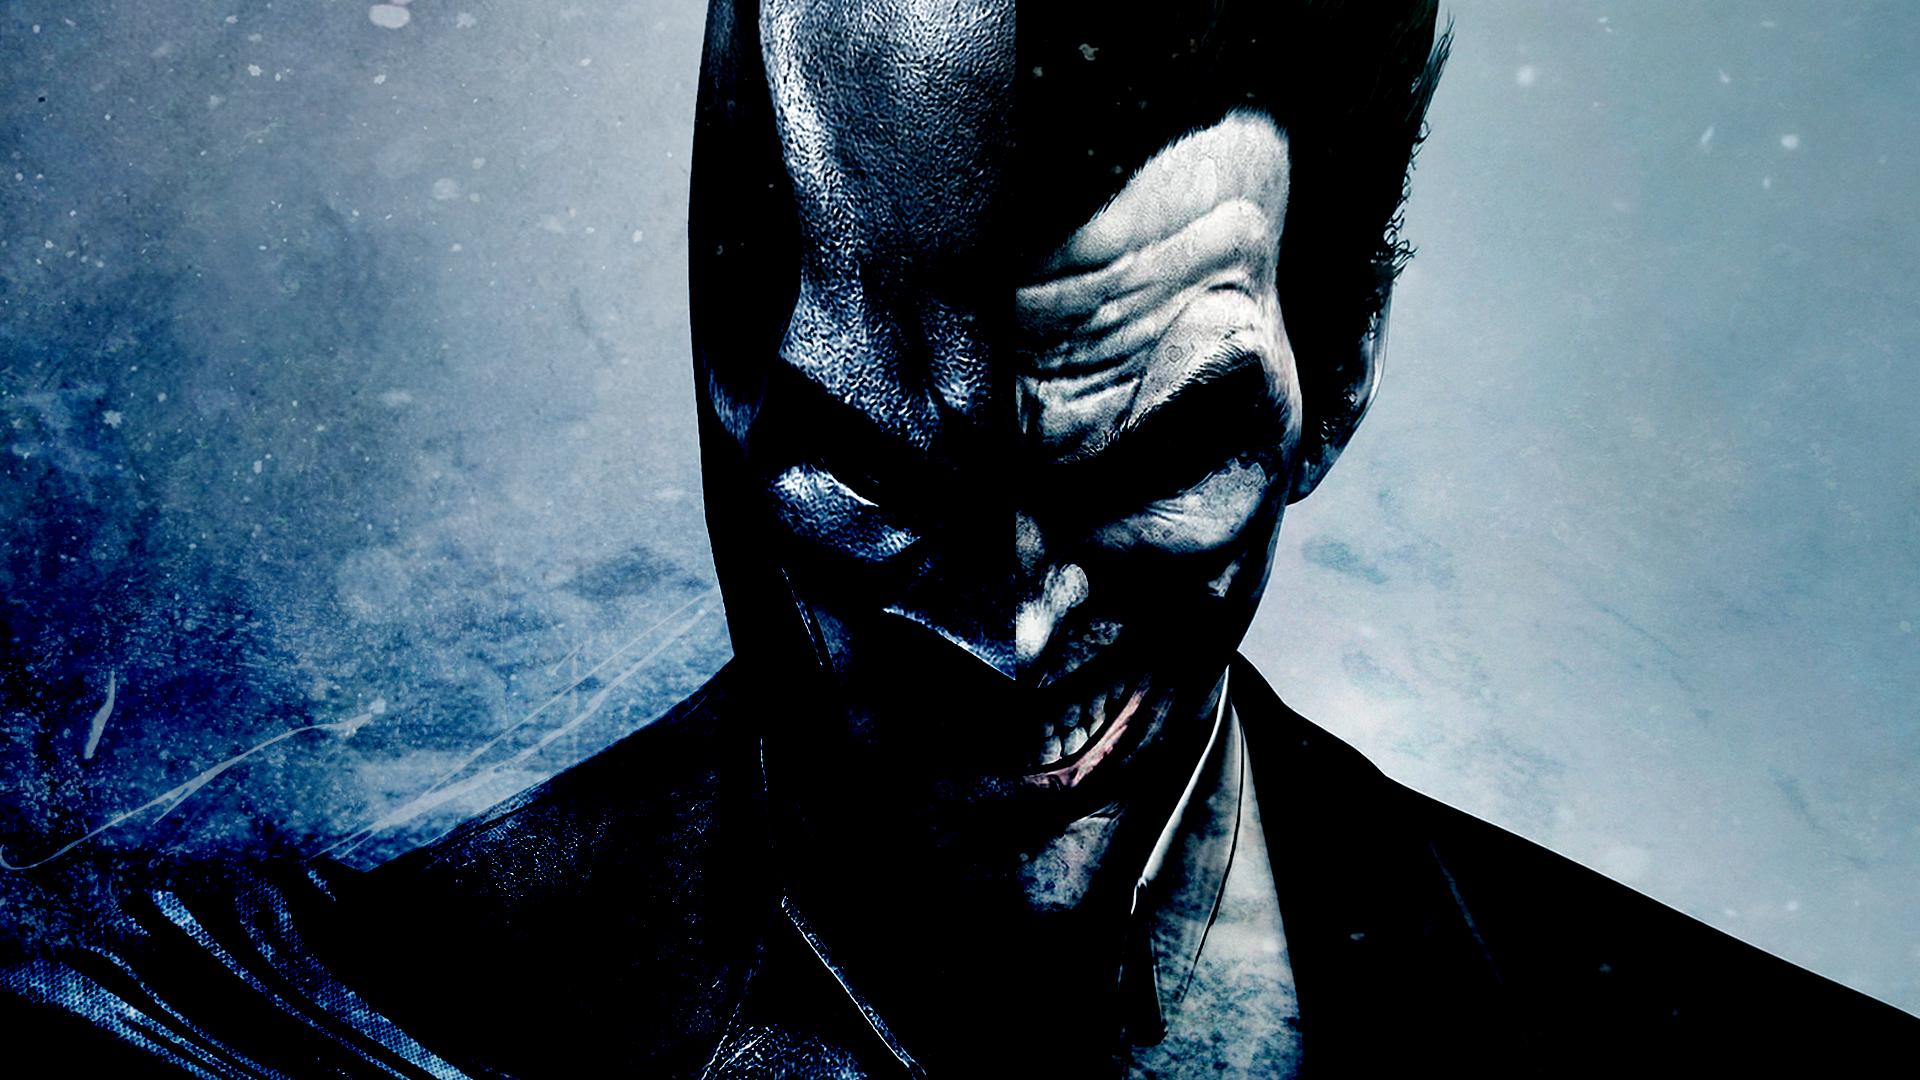 Batman Wallpaper - Batman VS Joker Ver2 by eziocaval on DeviantArt